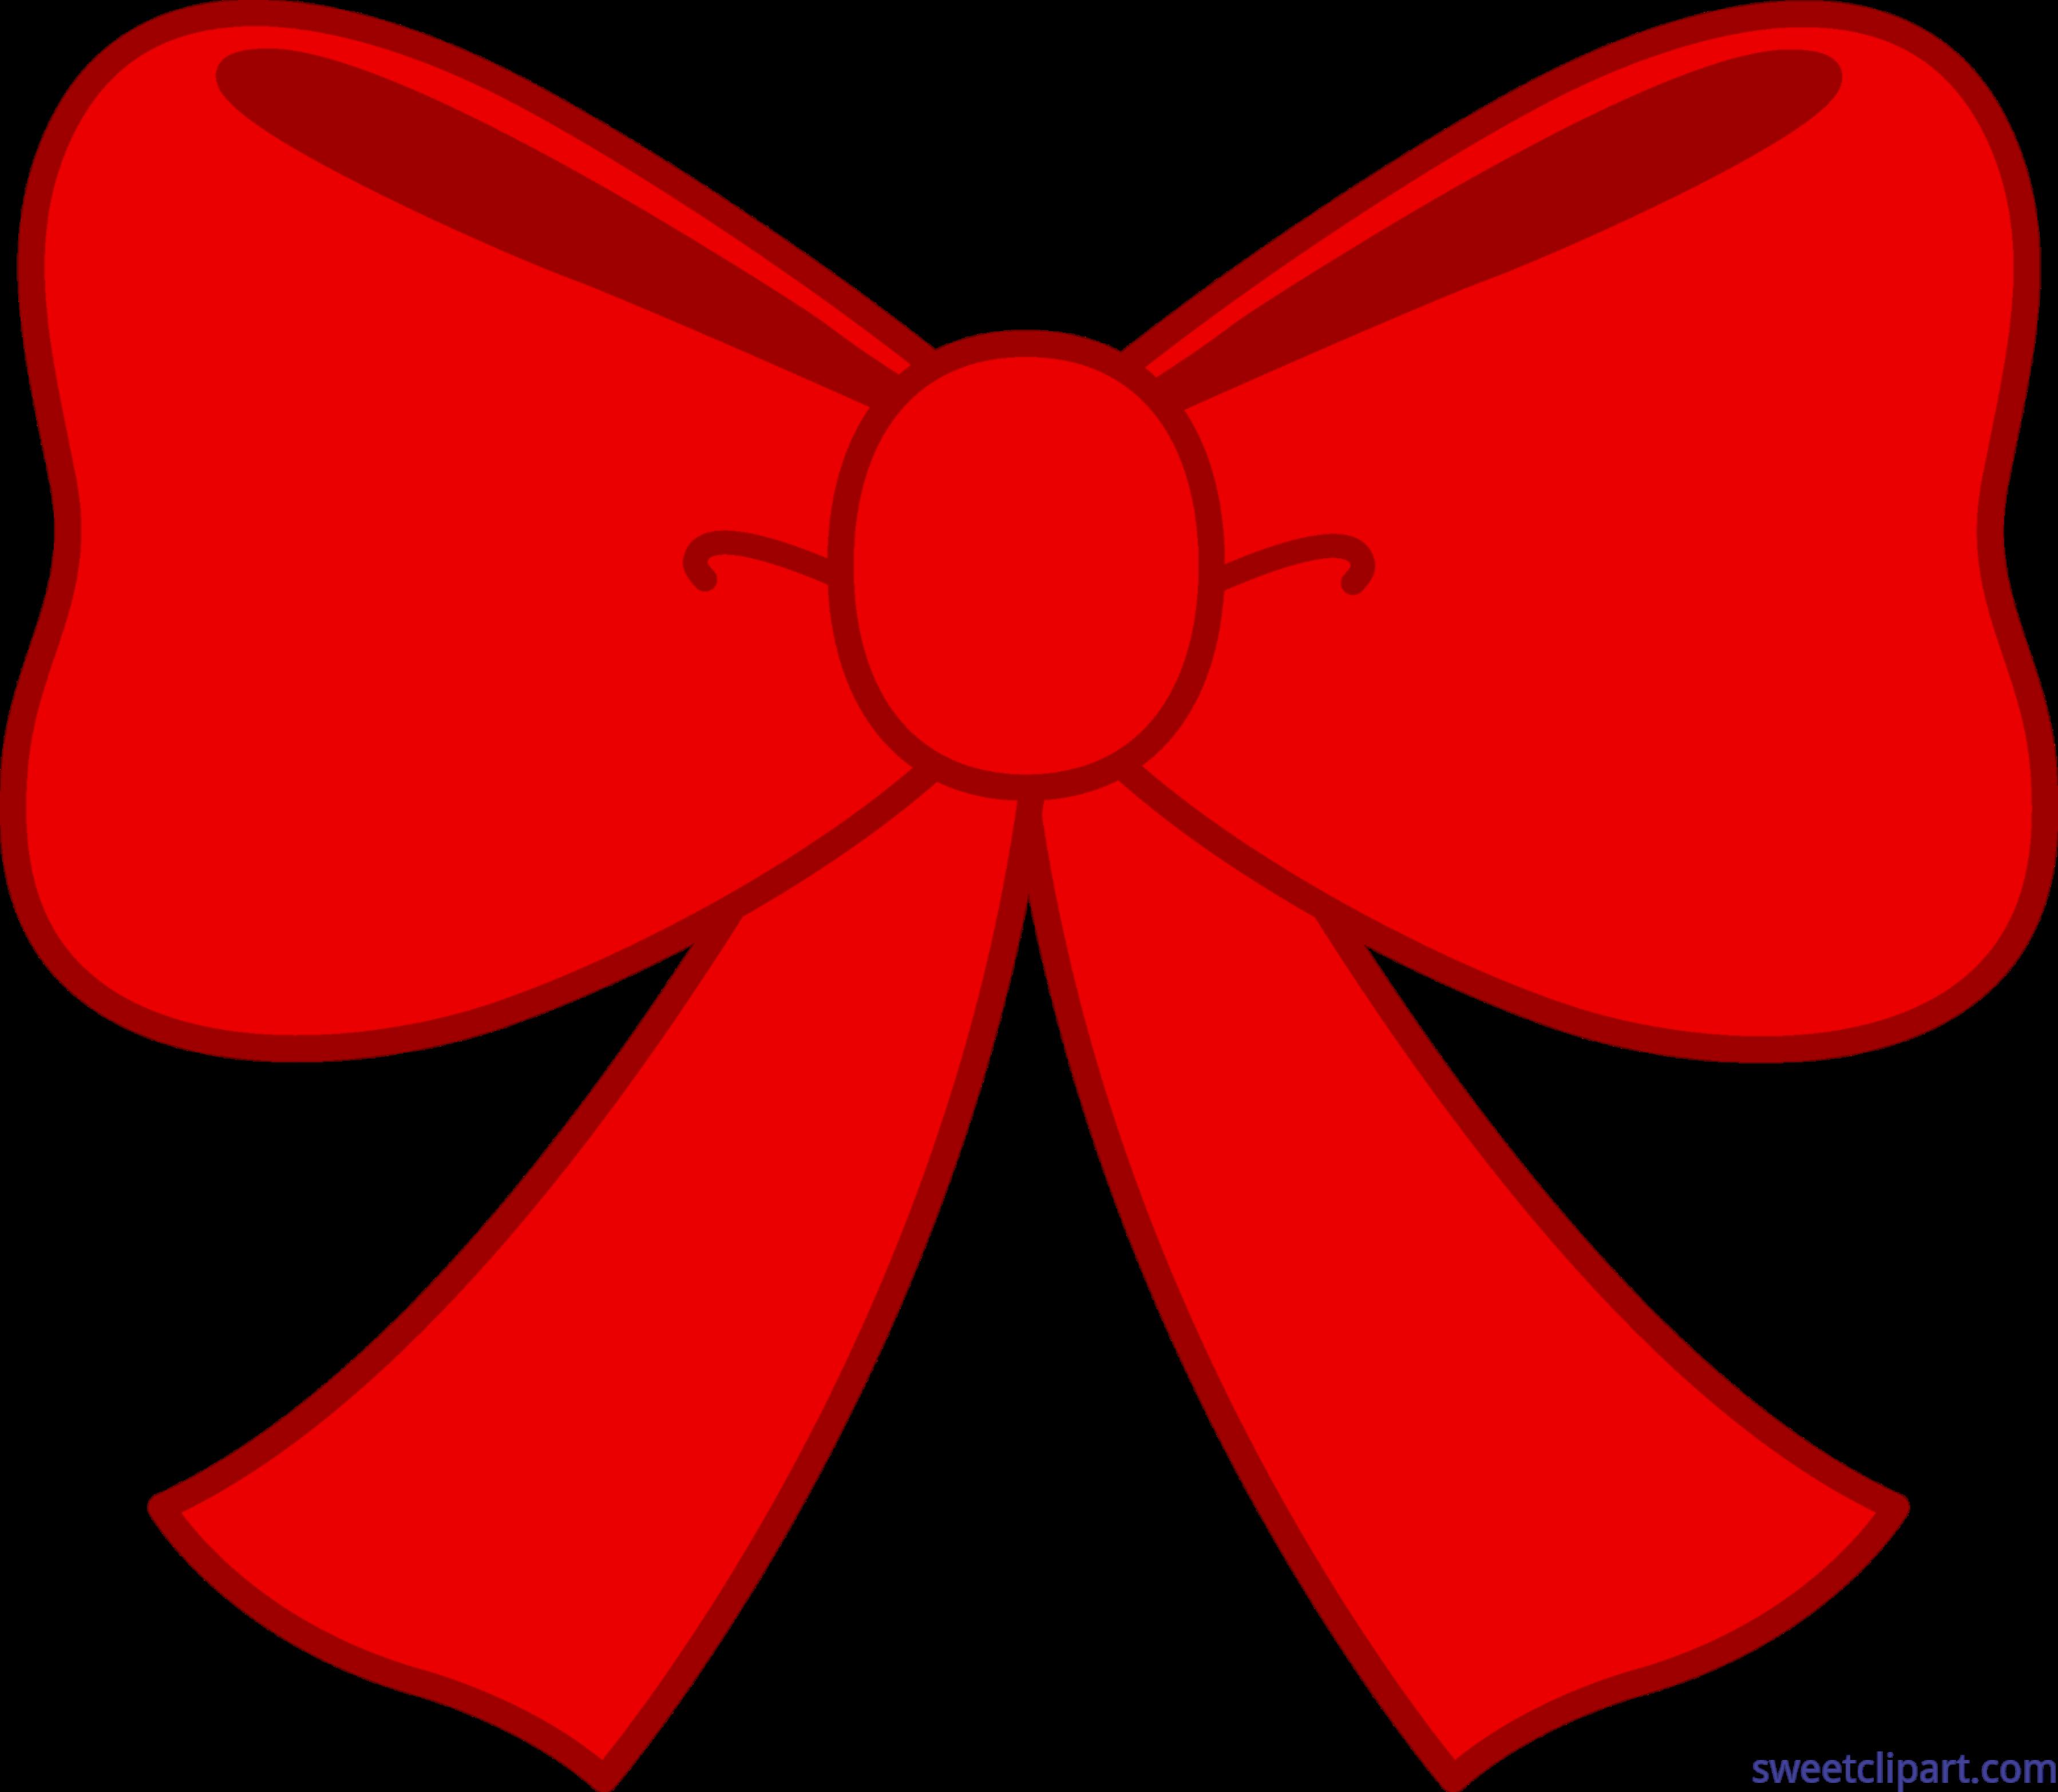 Clipart bow red. Cute clip art sweet